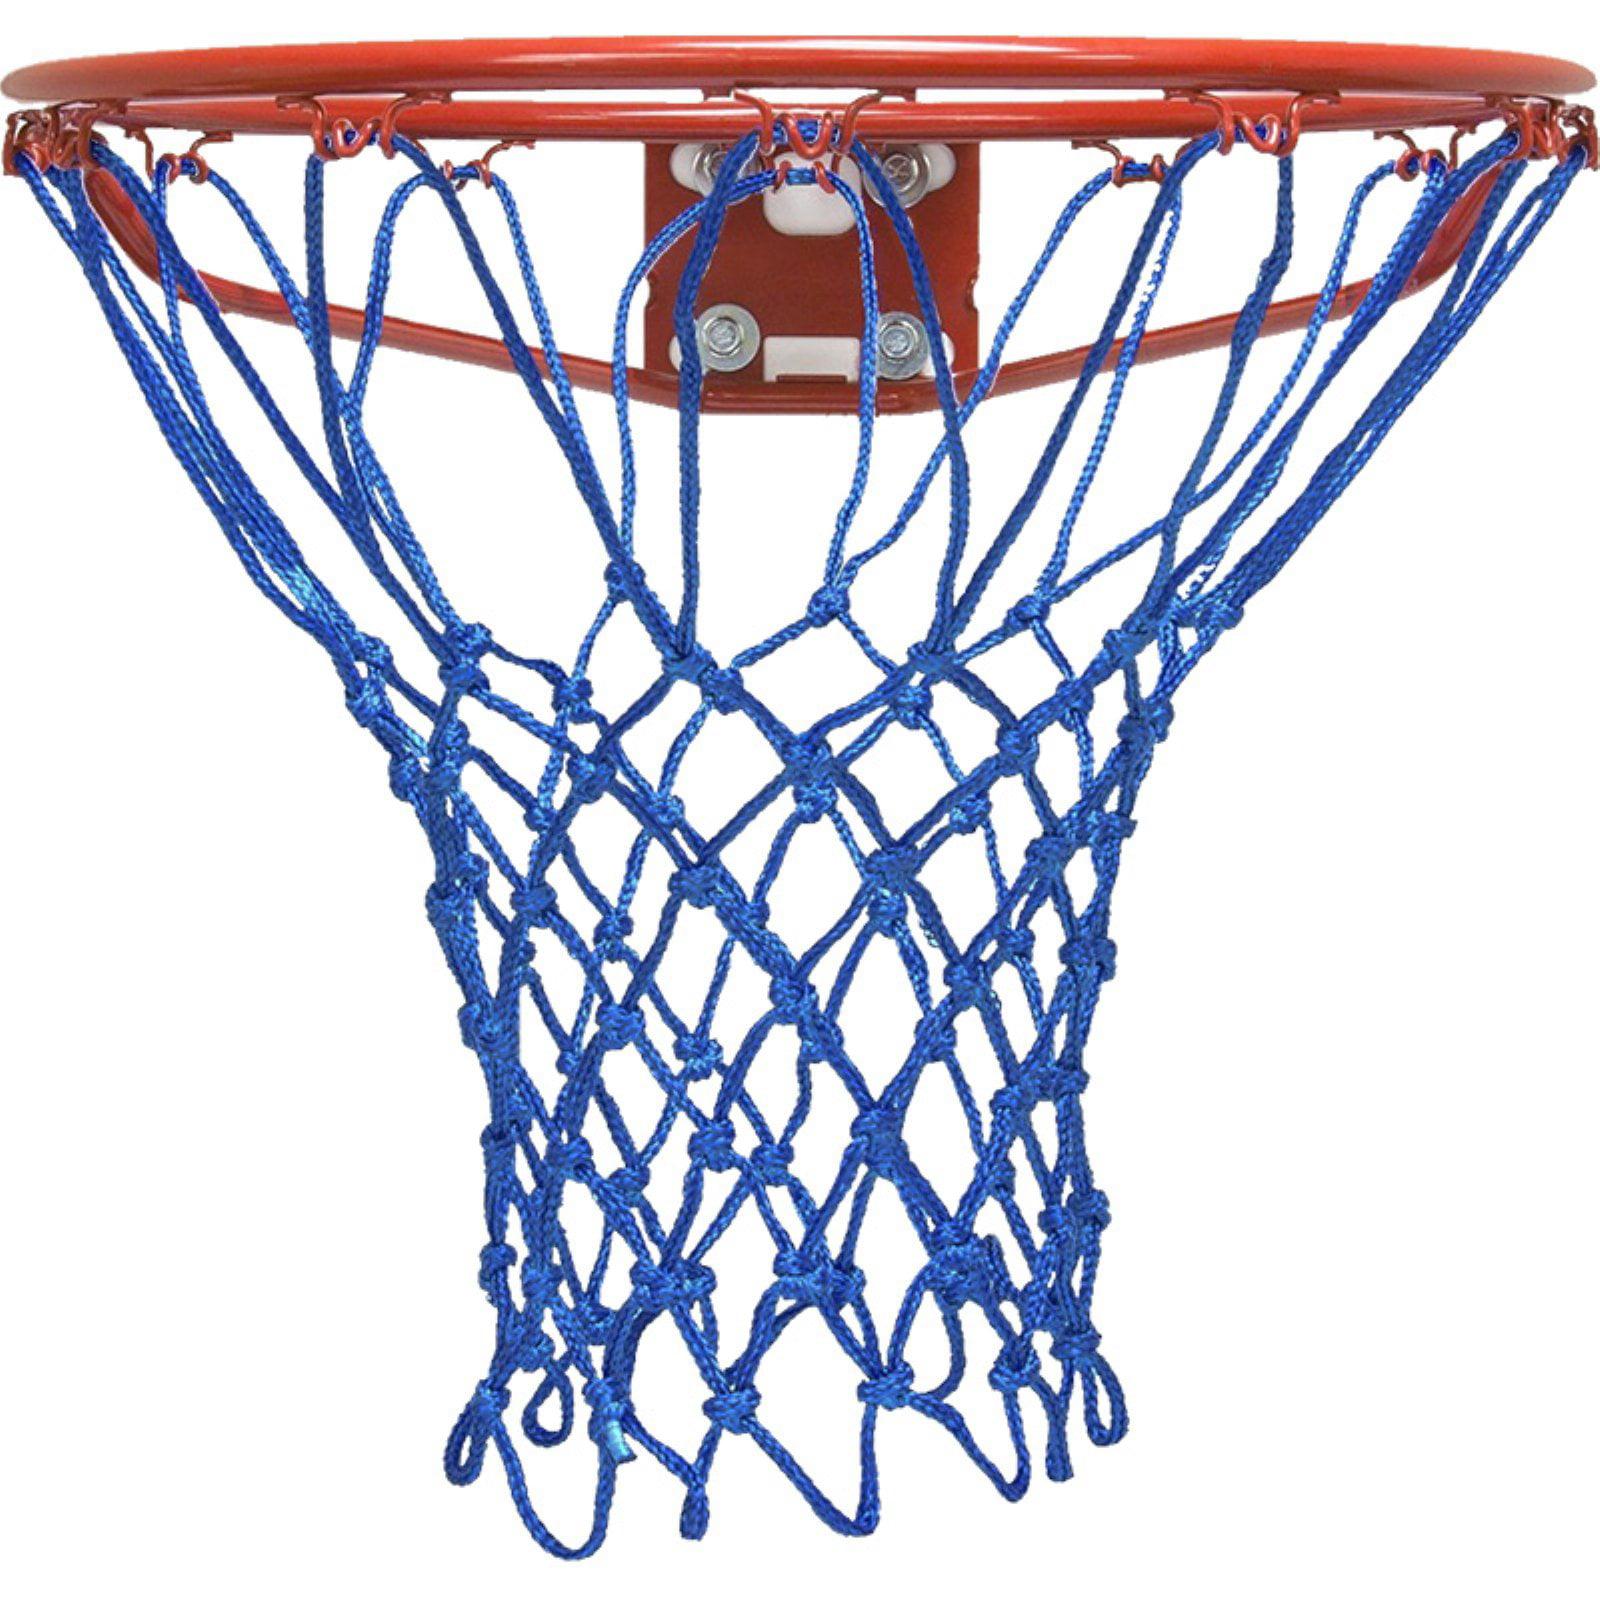 Basketball Net Heavy Duty Metal Chain Replacement S-Hooks LP